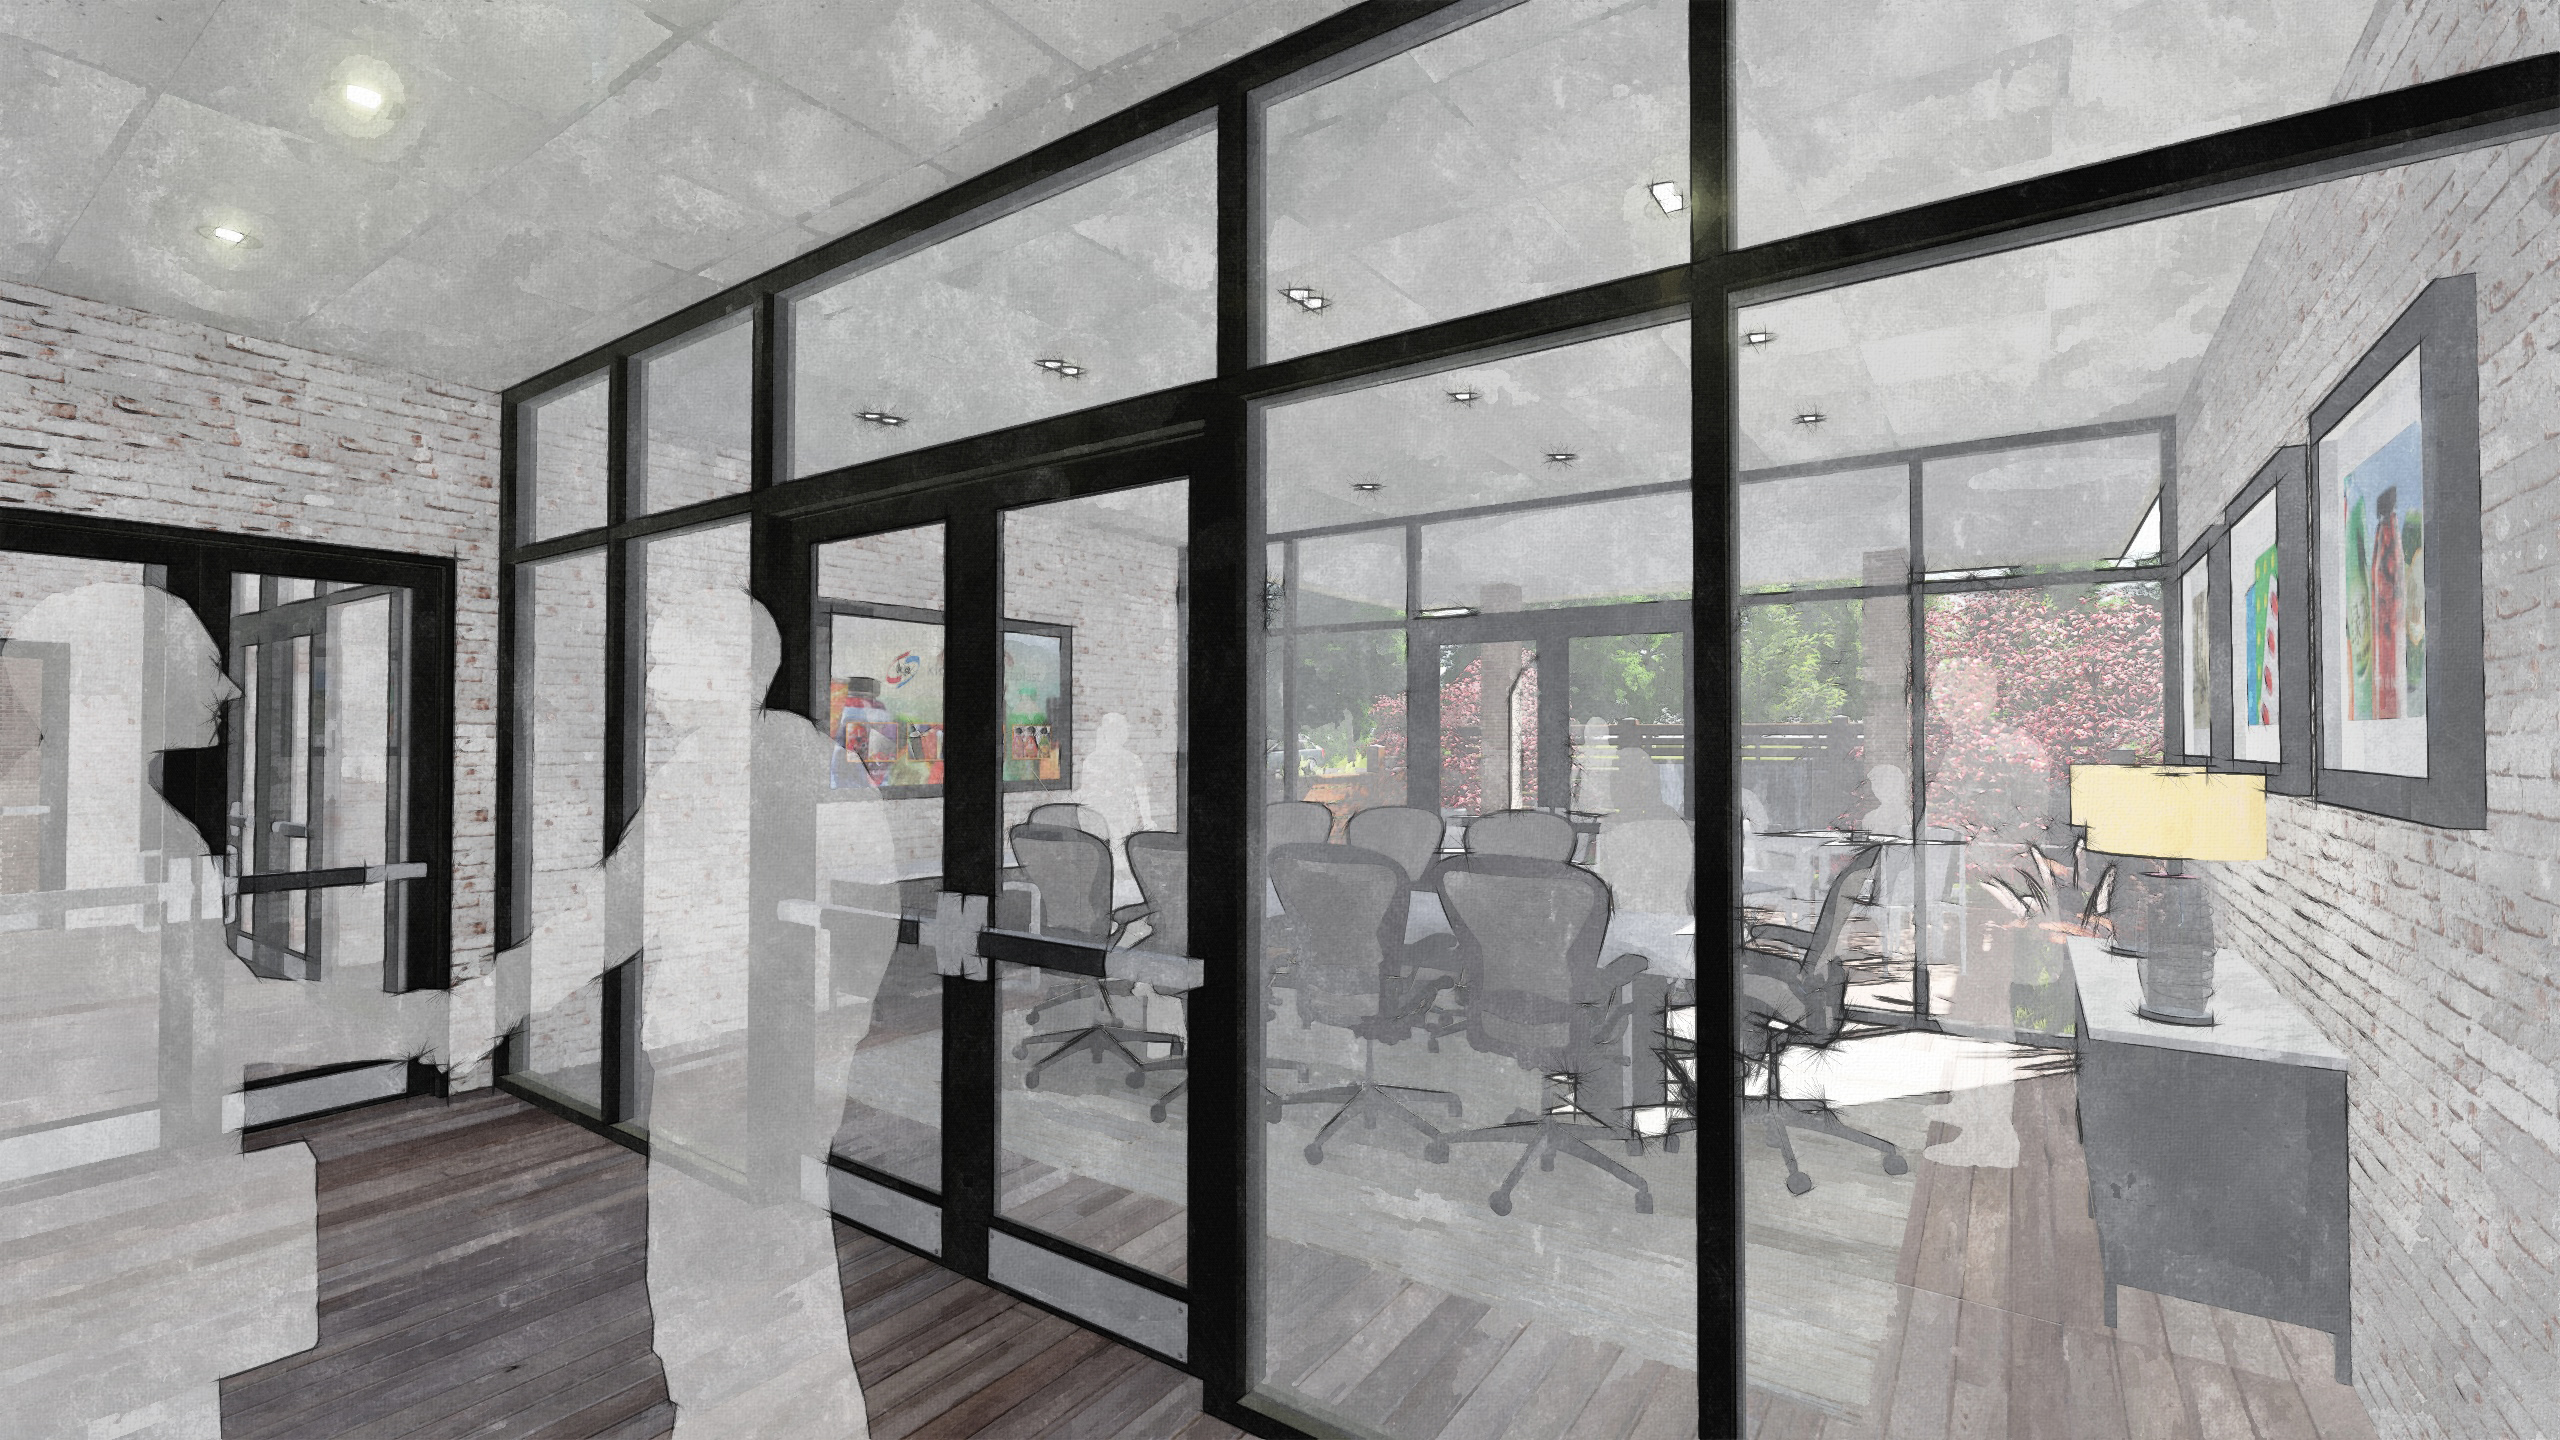 Hallways Outside Conference Room